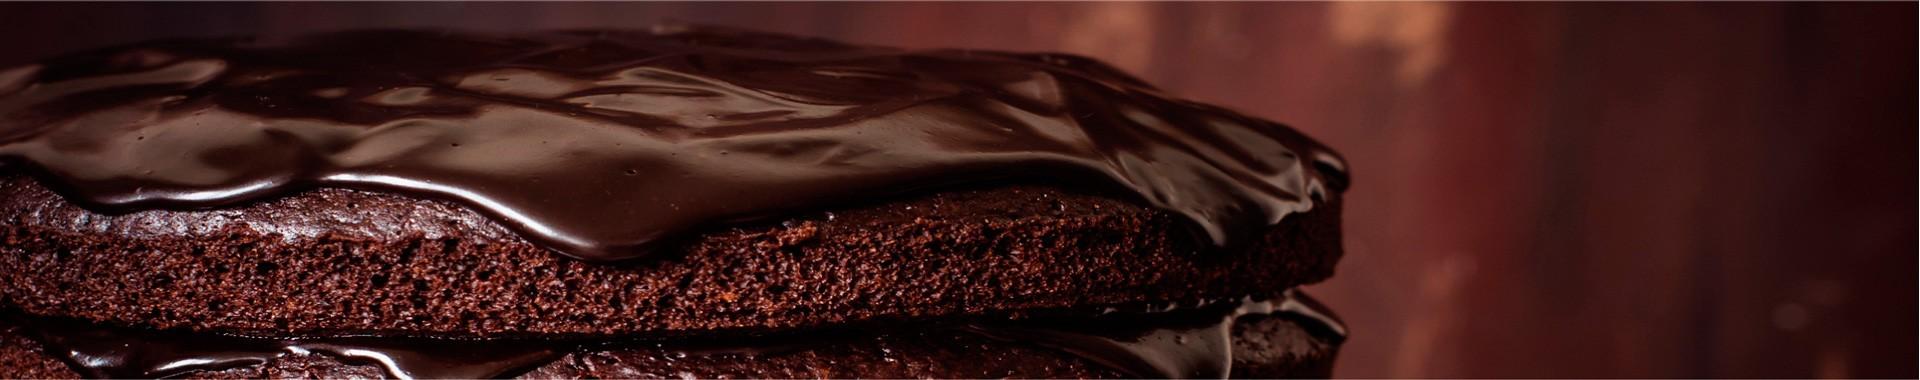 Semifrio de tres chocolates